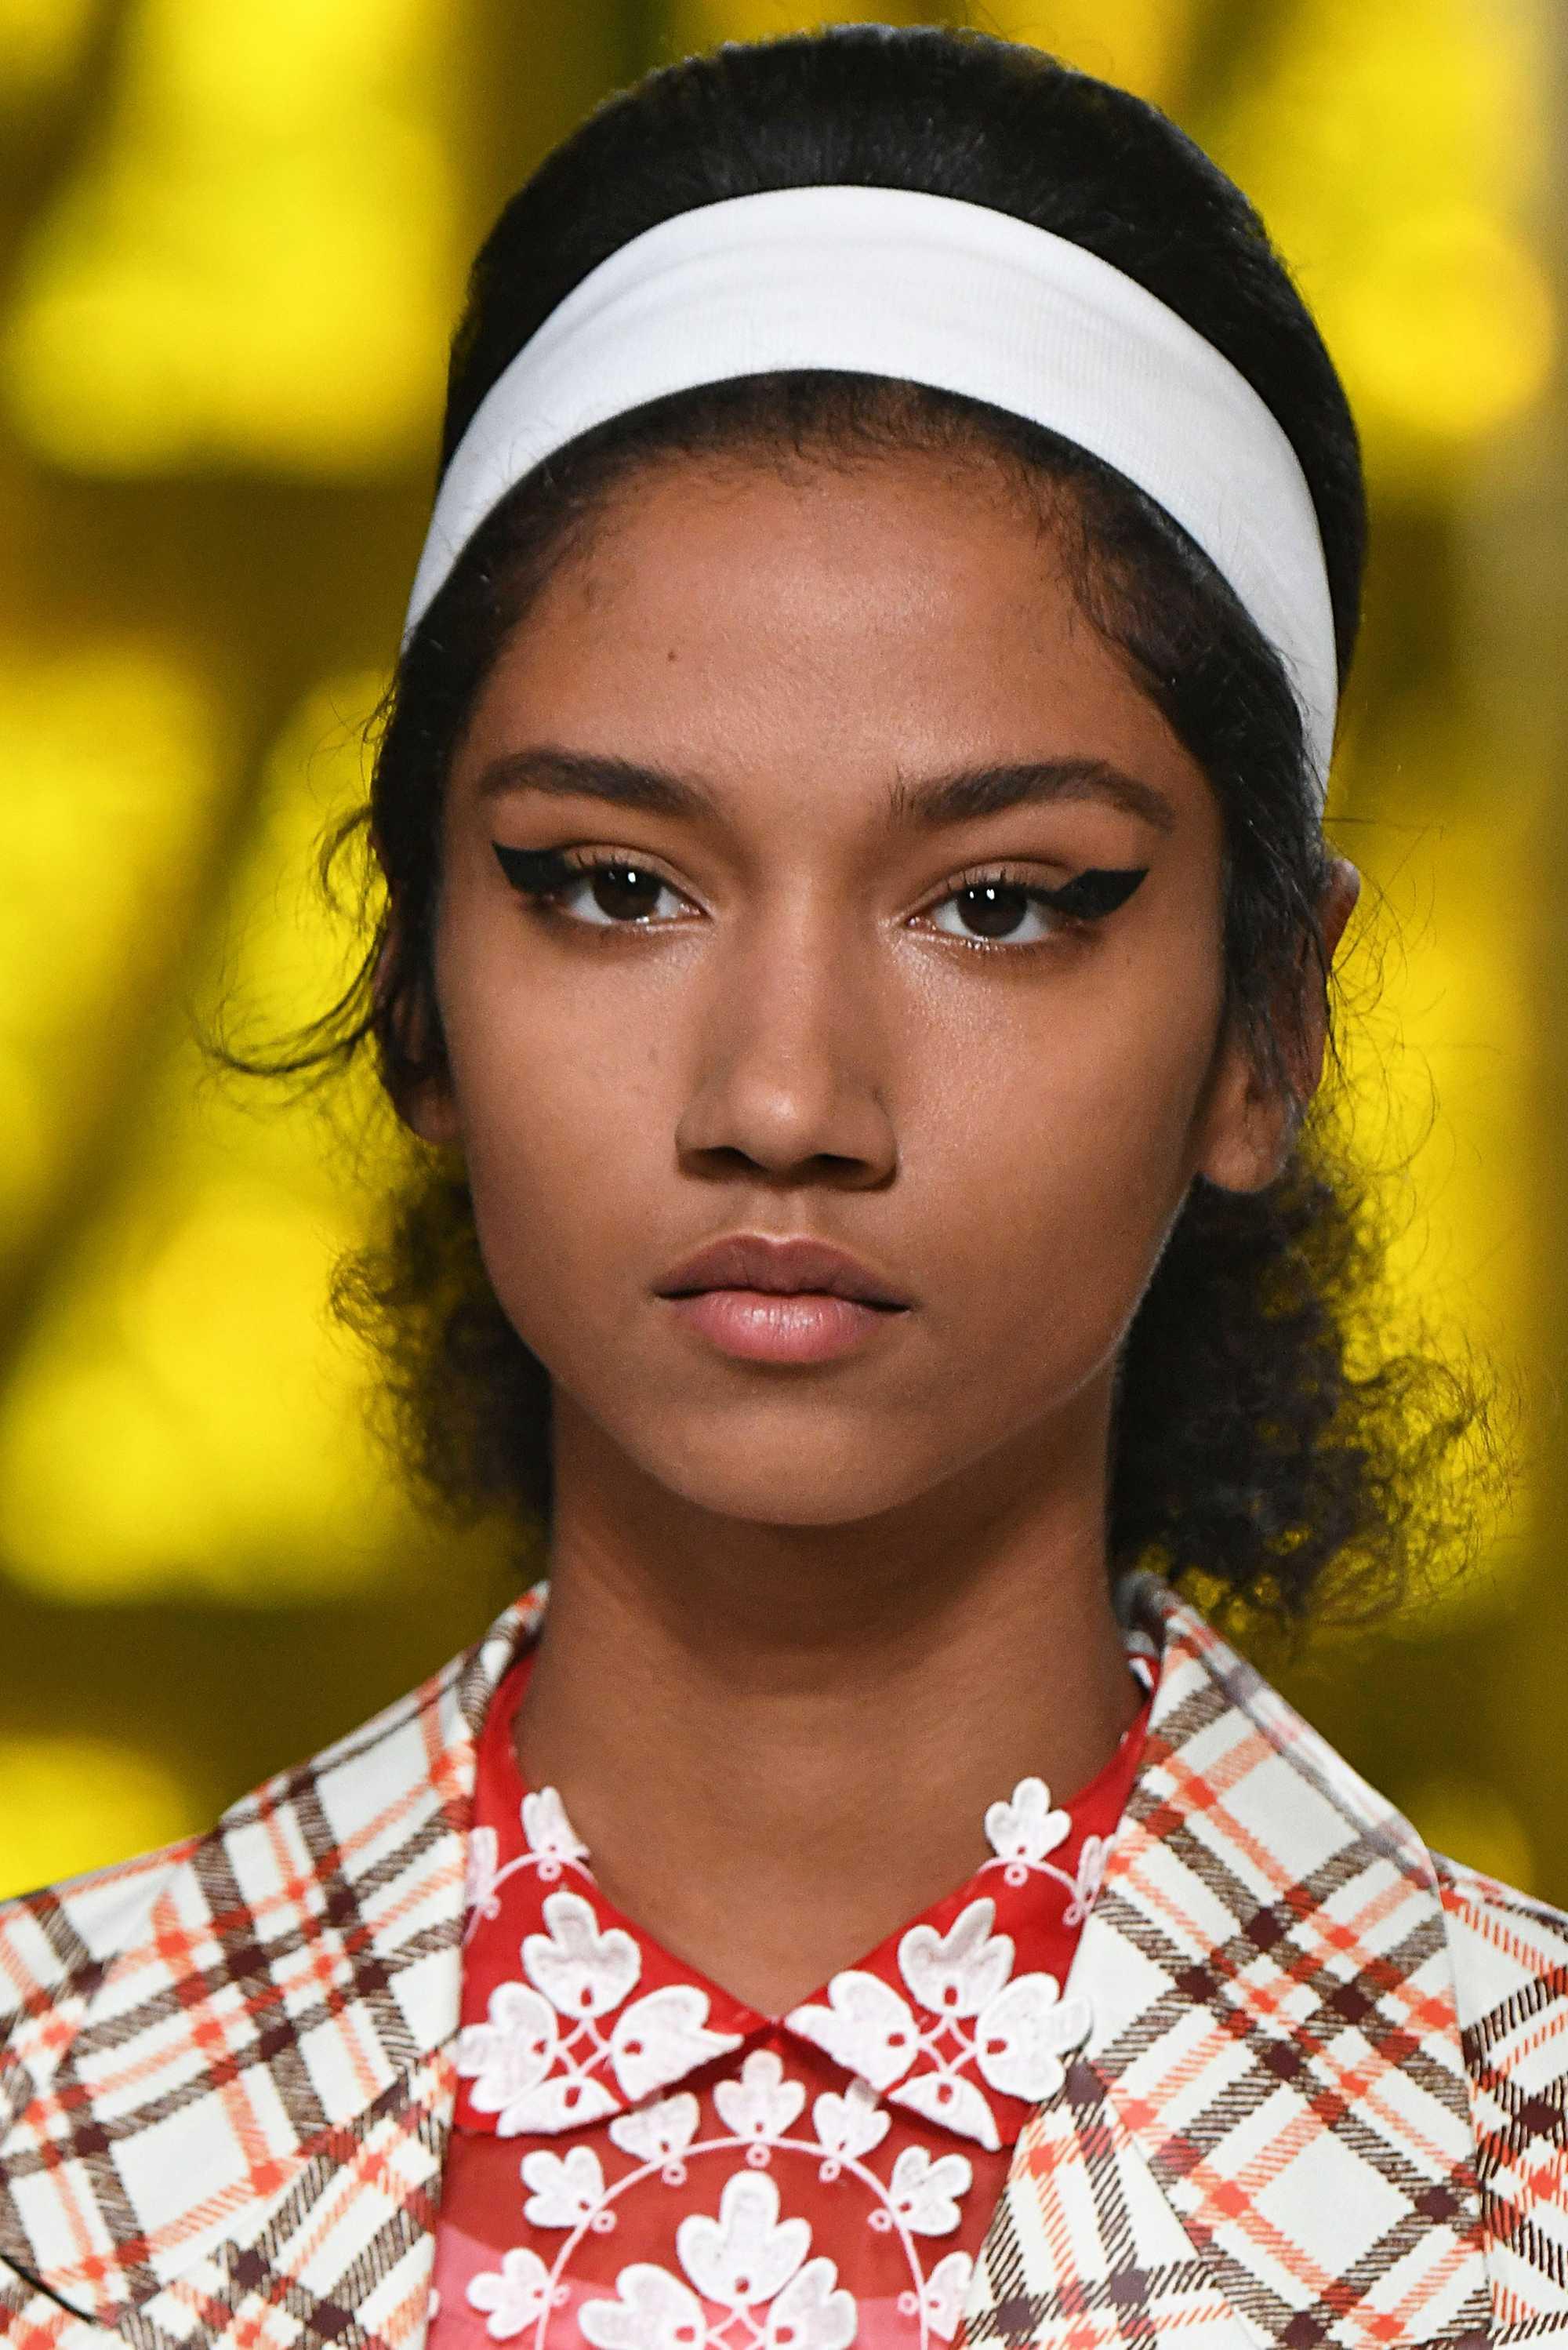 medium-how-to-style-hair-accessories-headbands-hairstyles-ways-to-wear-miu-miu-white-updo-retrovintage.jpg